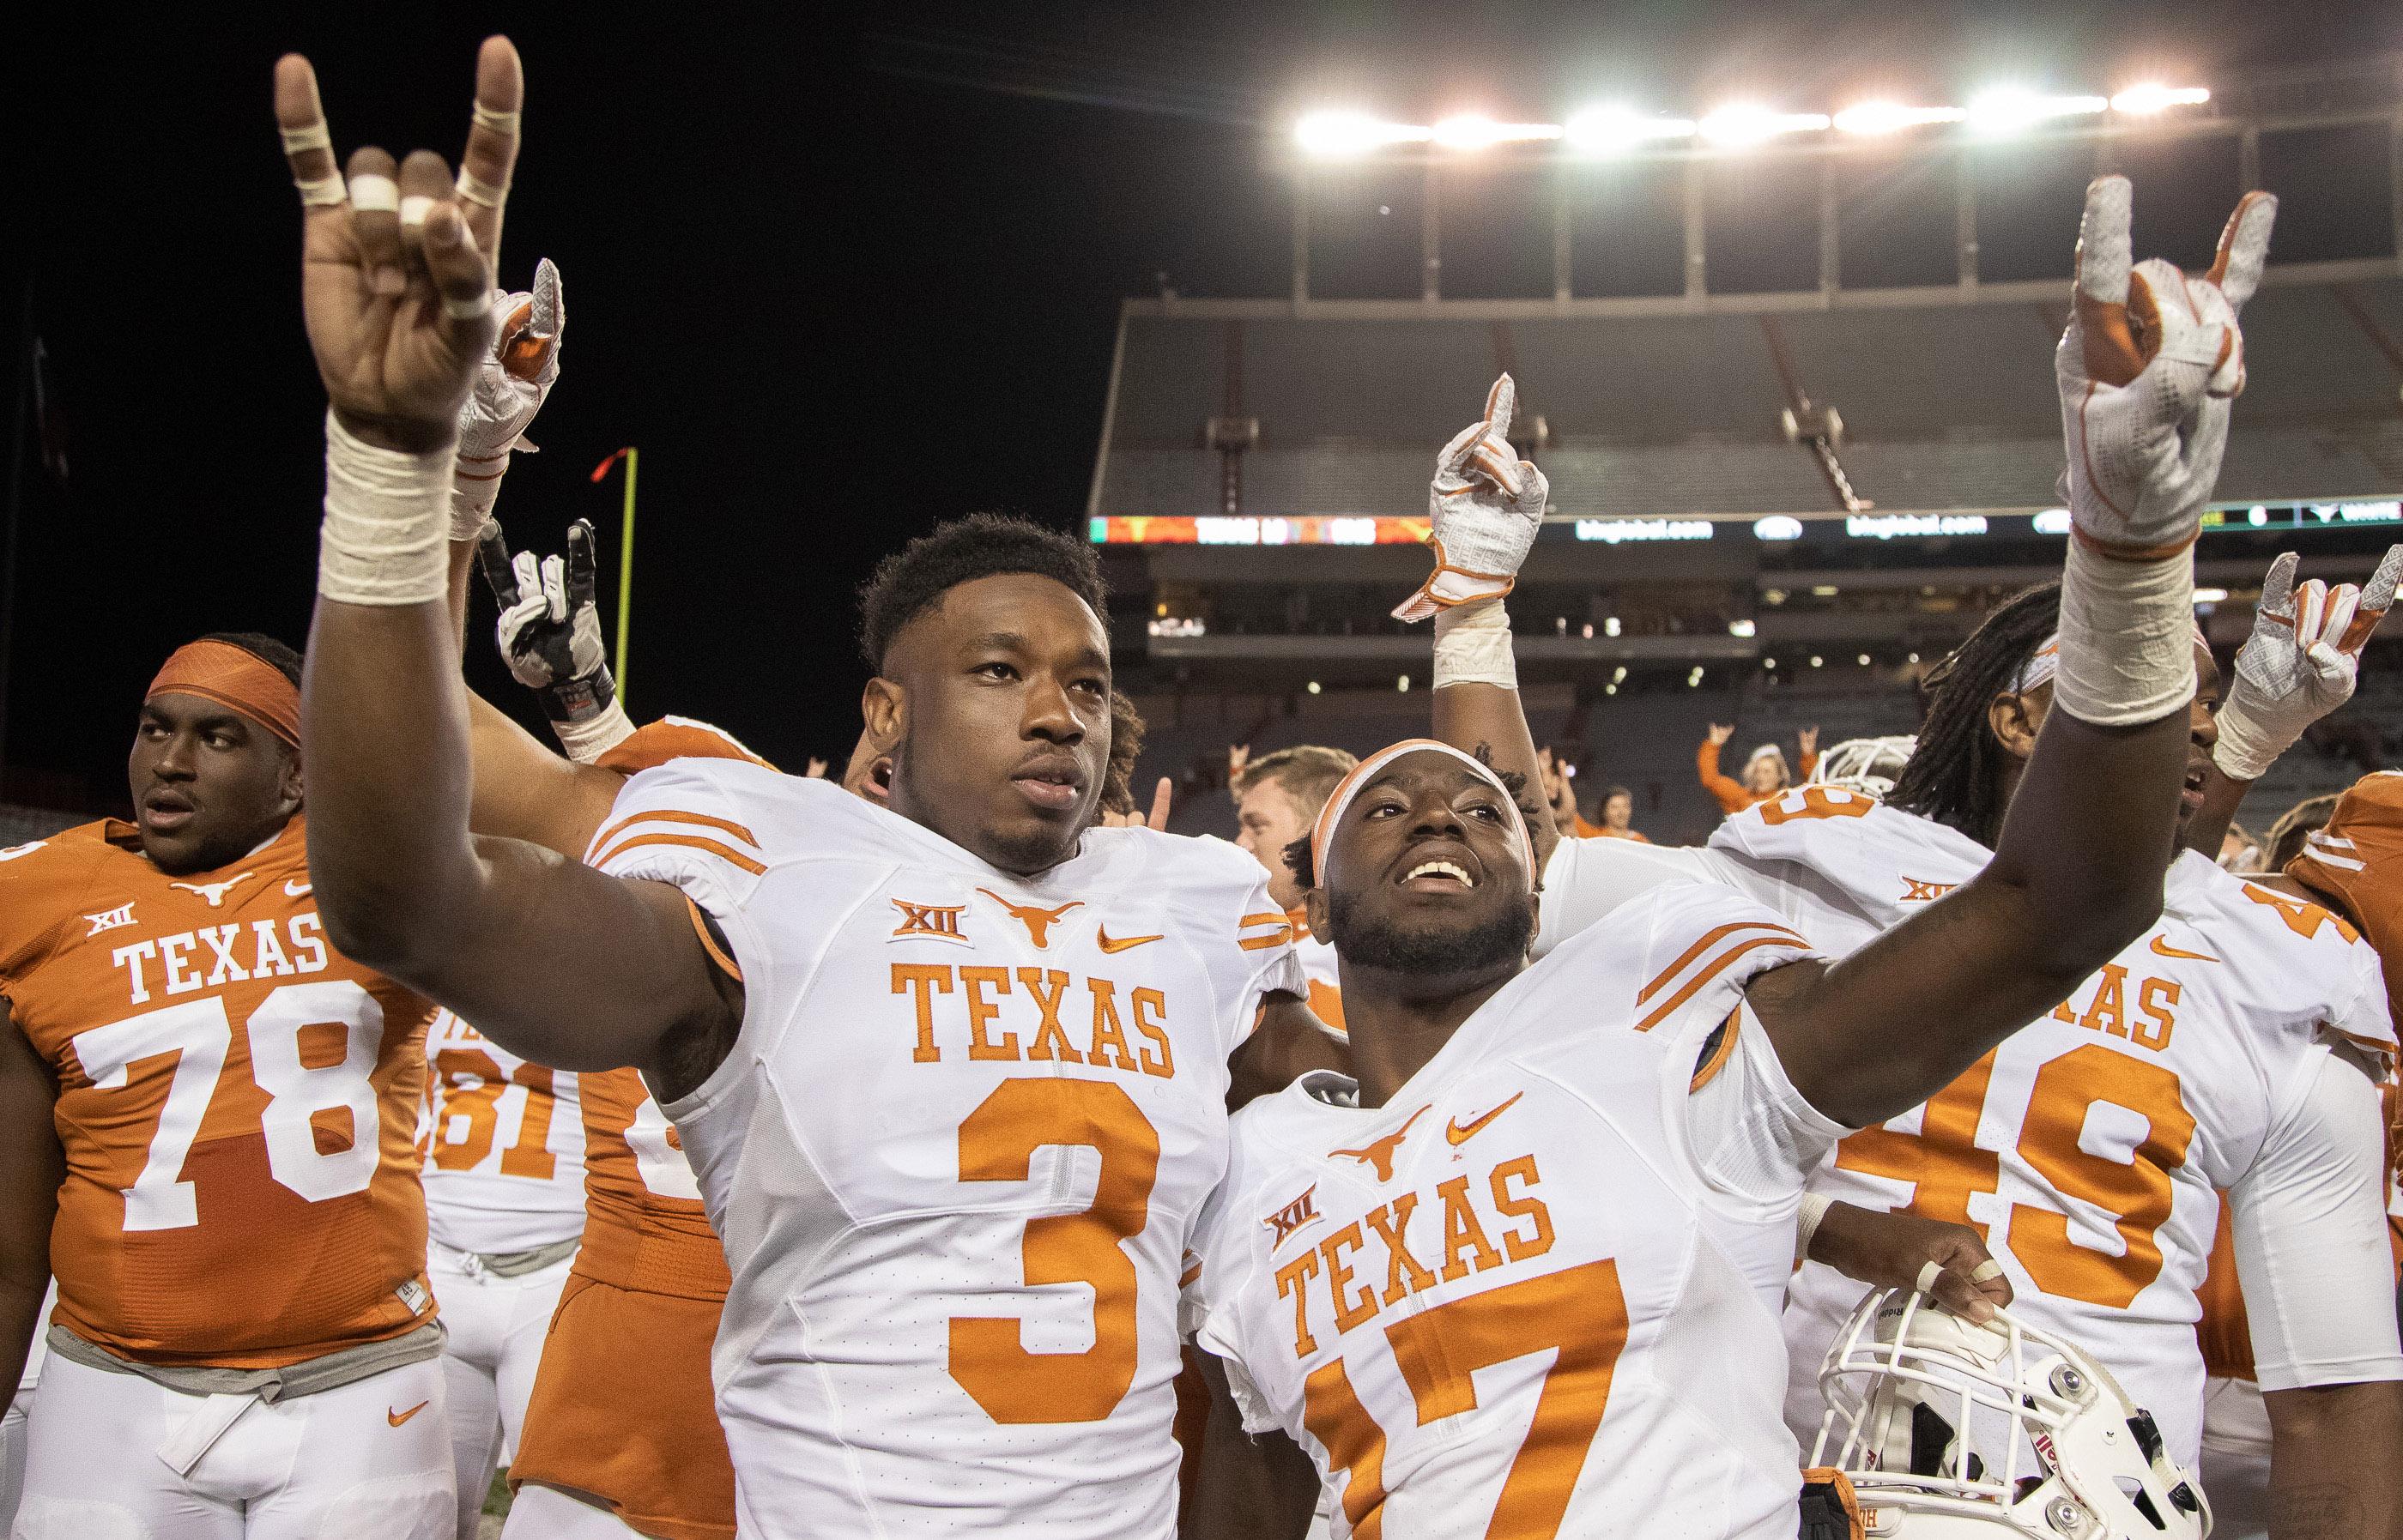 Texas Longhorns Recruiting - Burnt Orange Nation